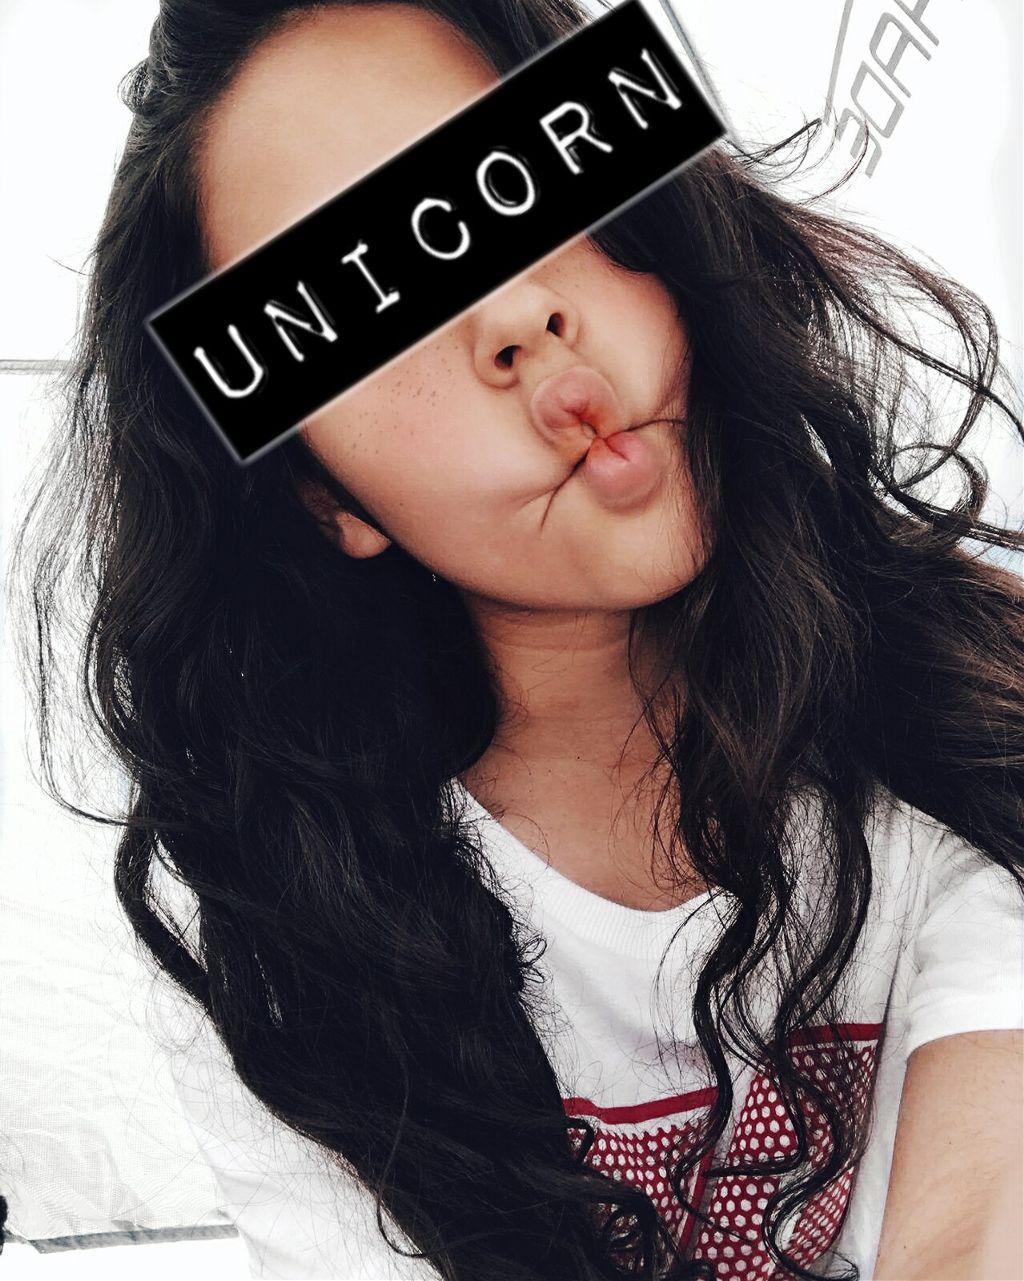 Picsart Instagram Tumblr Tumblrgirls Girl Crazy Unicorn